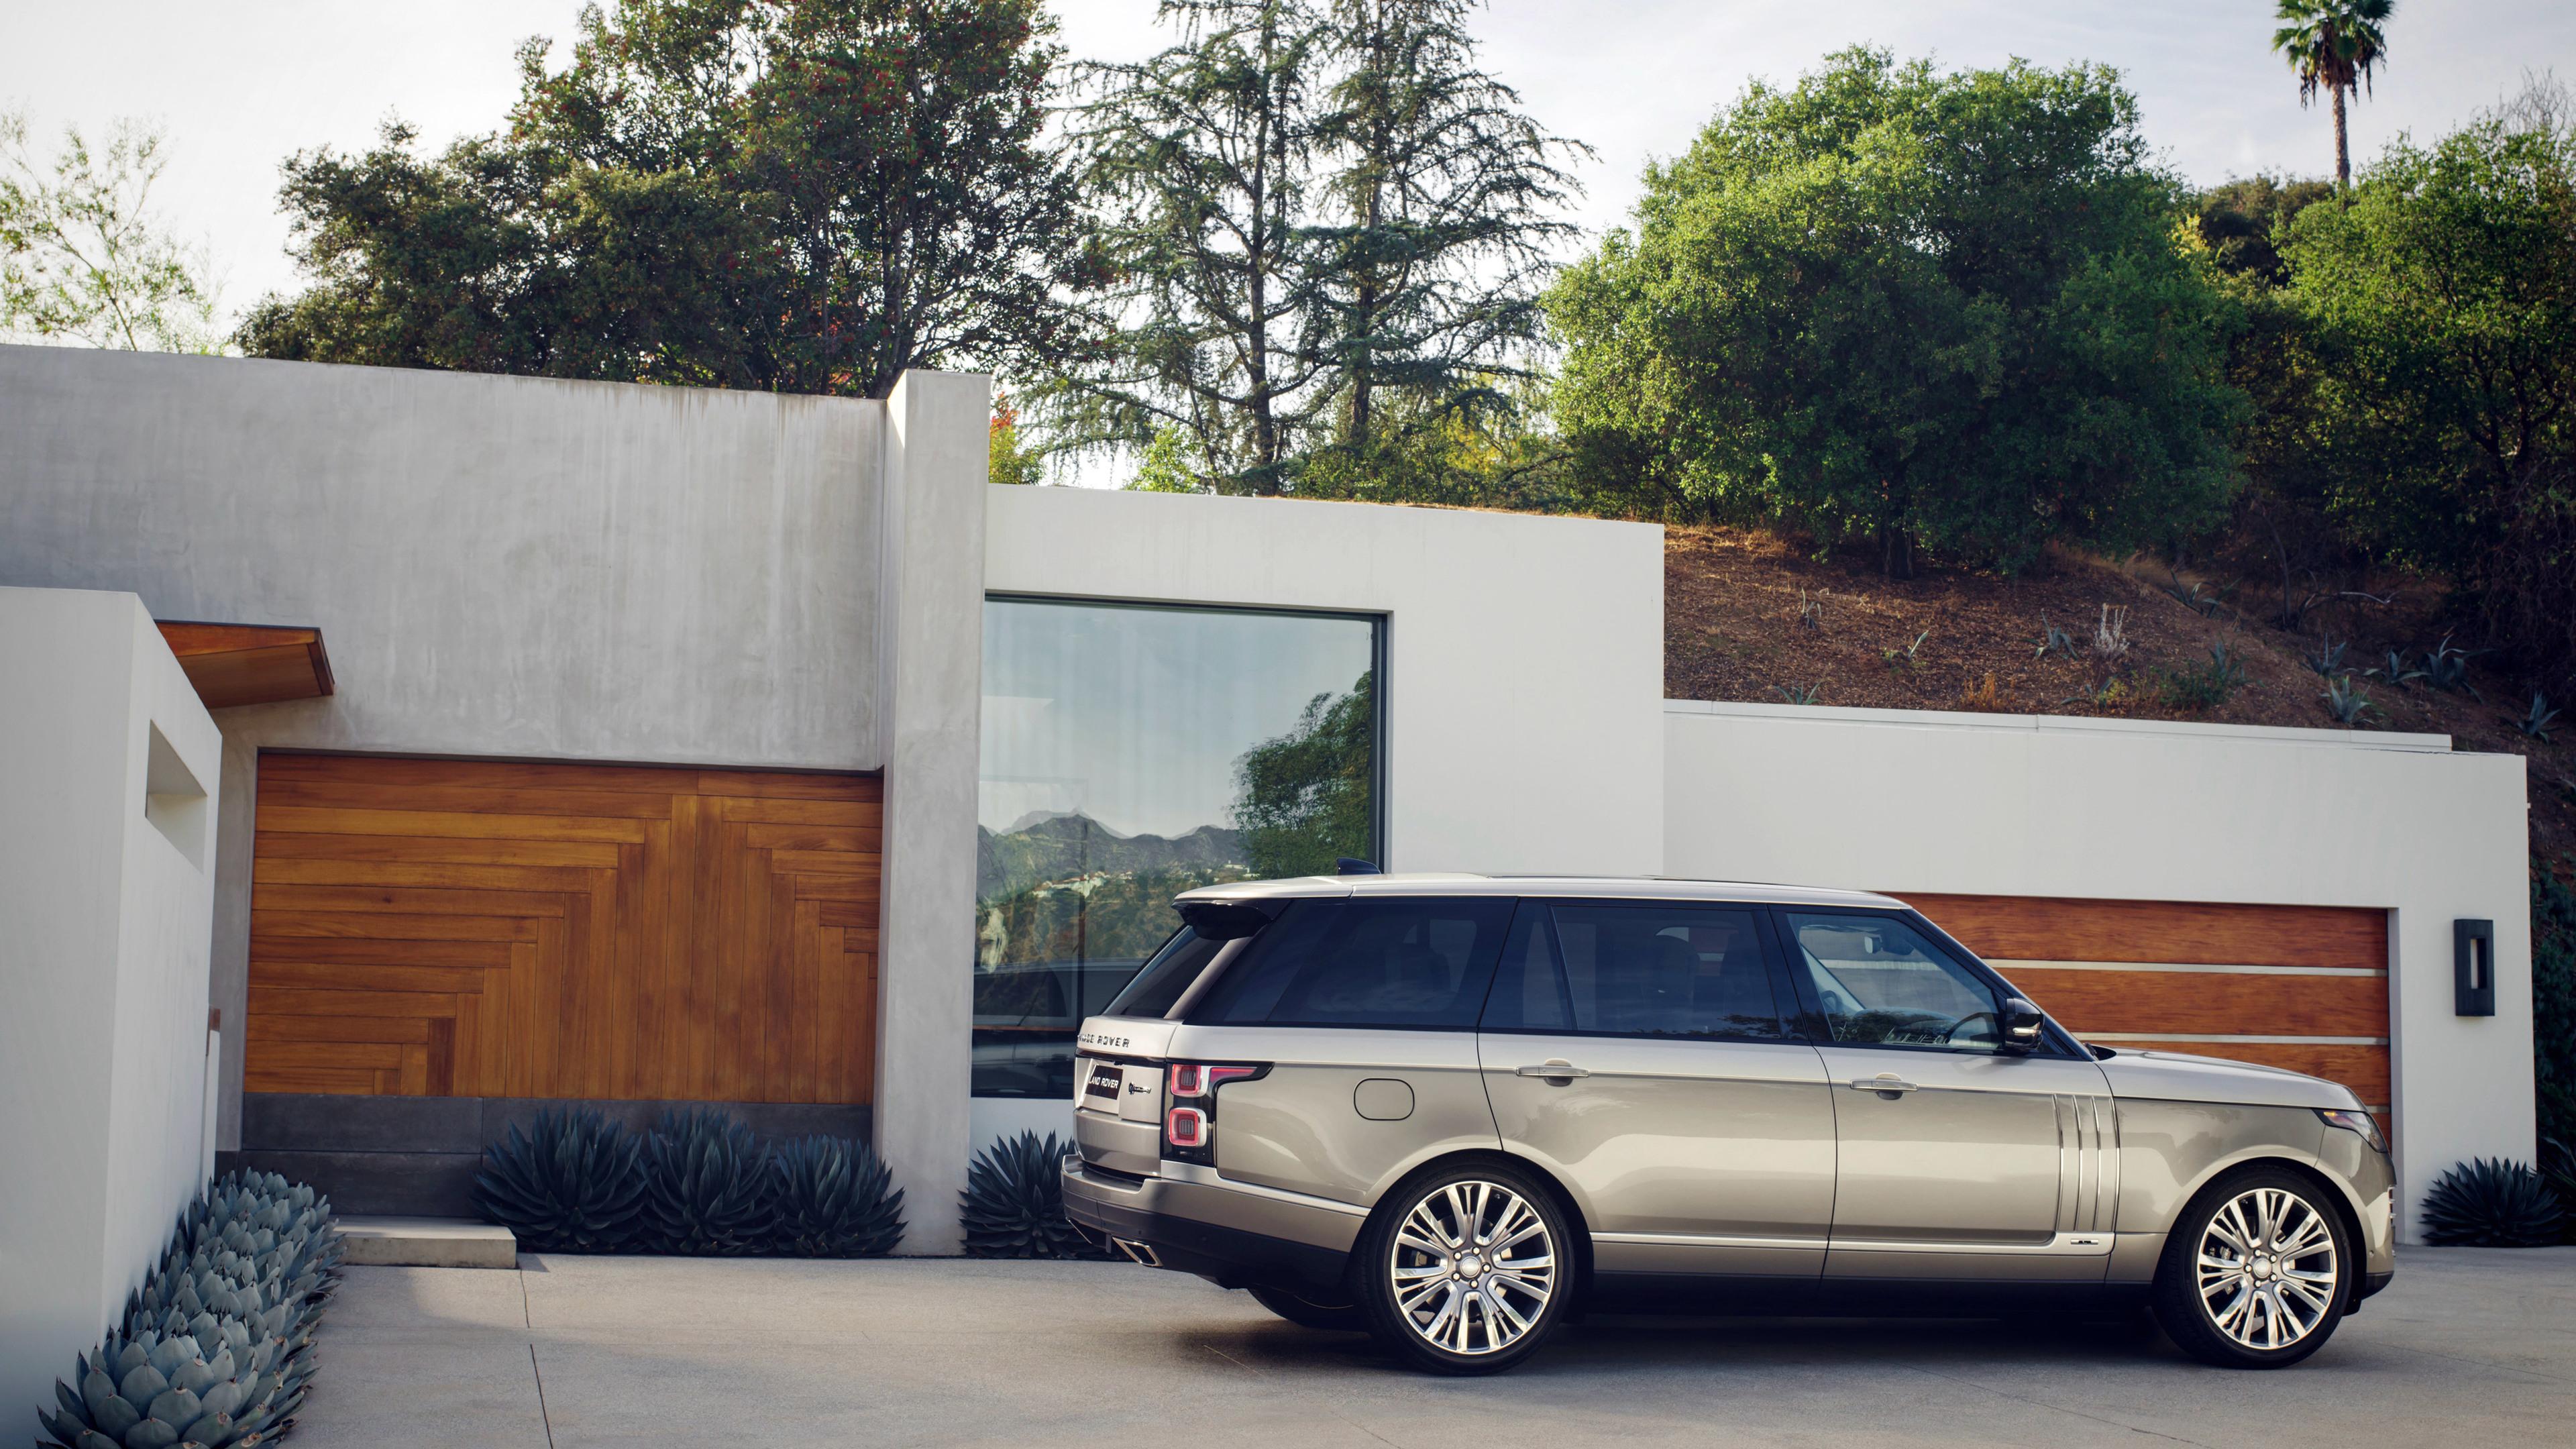 range rover svautobiography 2018 4k 1539108190 - Range Rover SVAutobiography 2018 4k - range rover wallpapers, range rover svautobiography wallpapers, hd-wallpapers, 4k-wallpapers, 2018 cars wallpapers